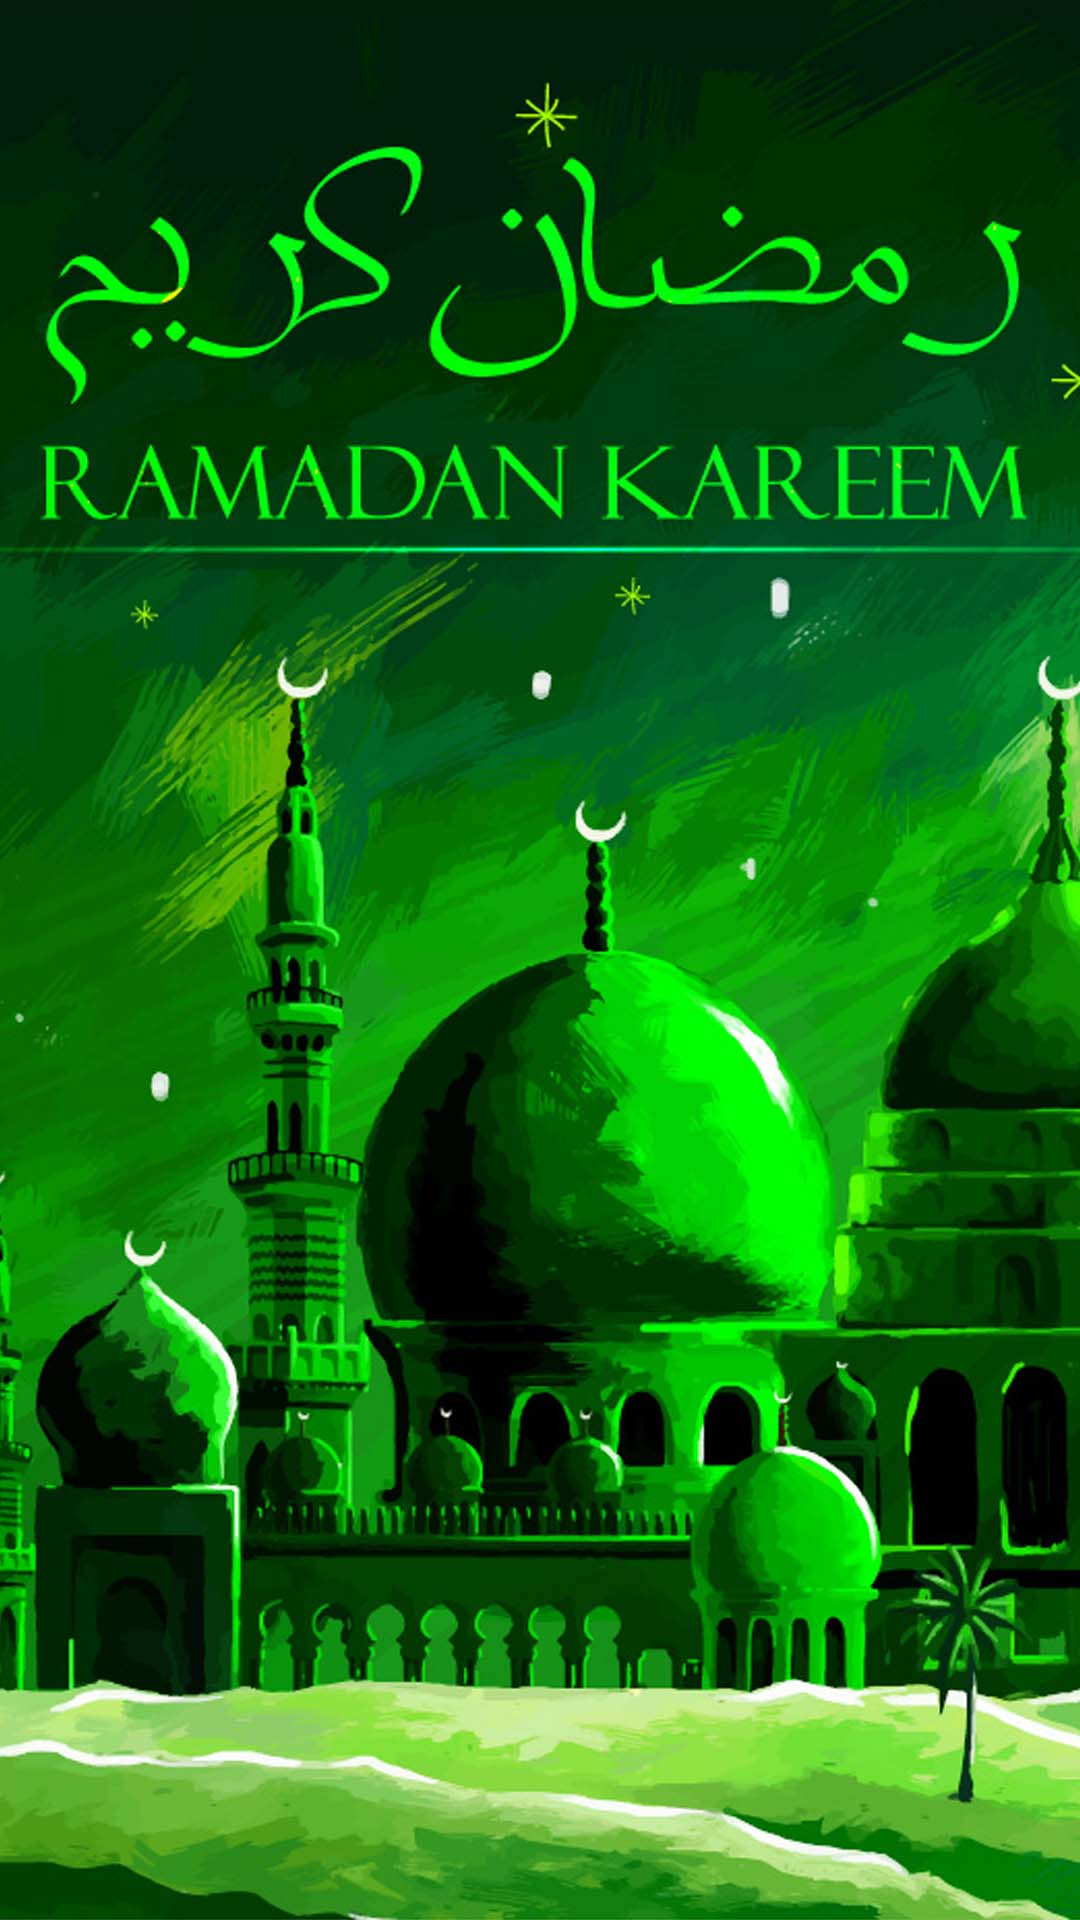 خلفيات موبايل رمضان كريم Mobile Wallpapers HD 14 خلفيات موبايل رمضان كريم Mobile Wallpapers HD